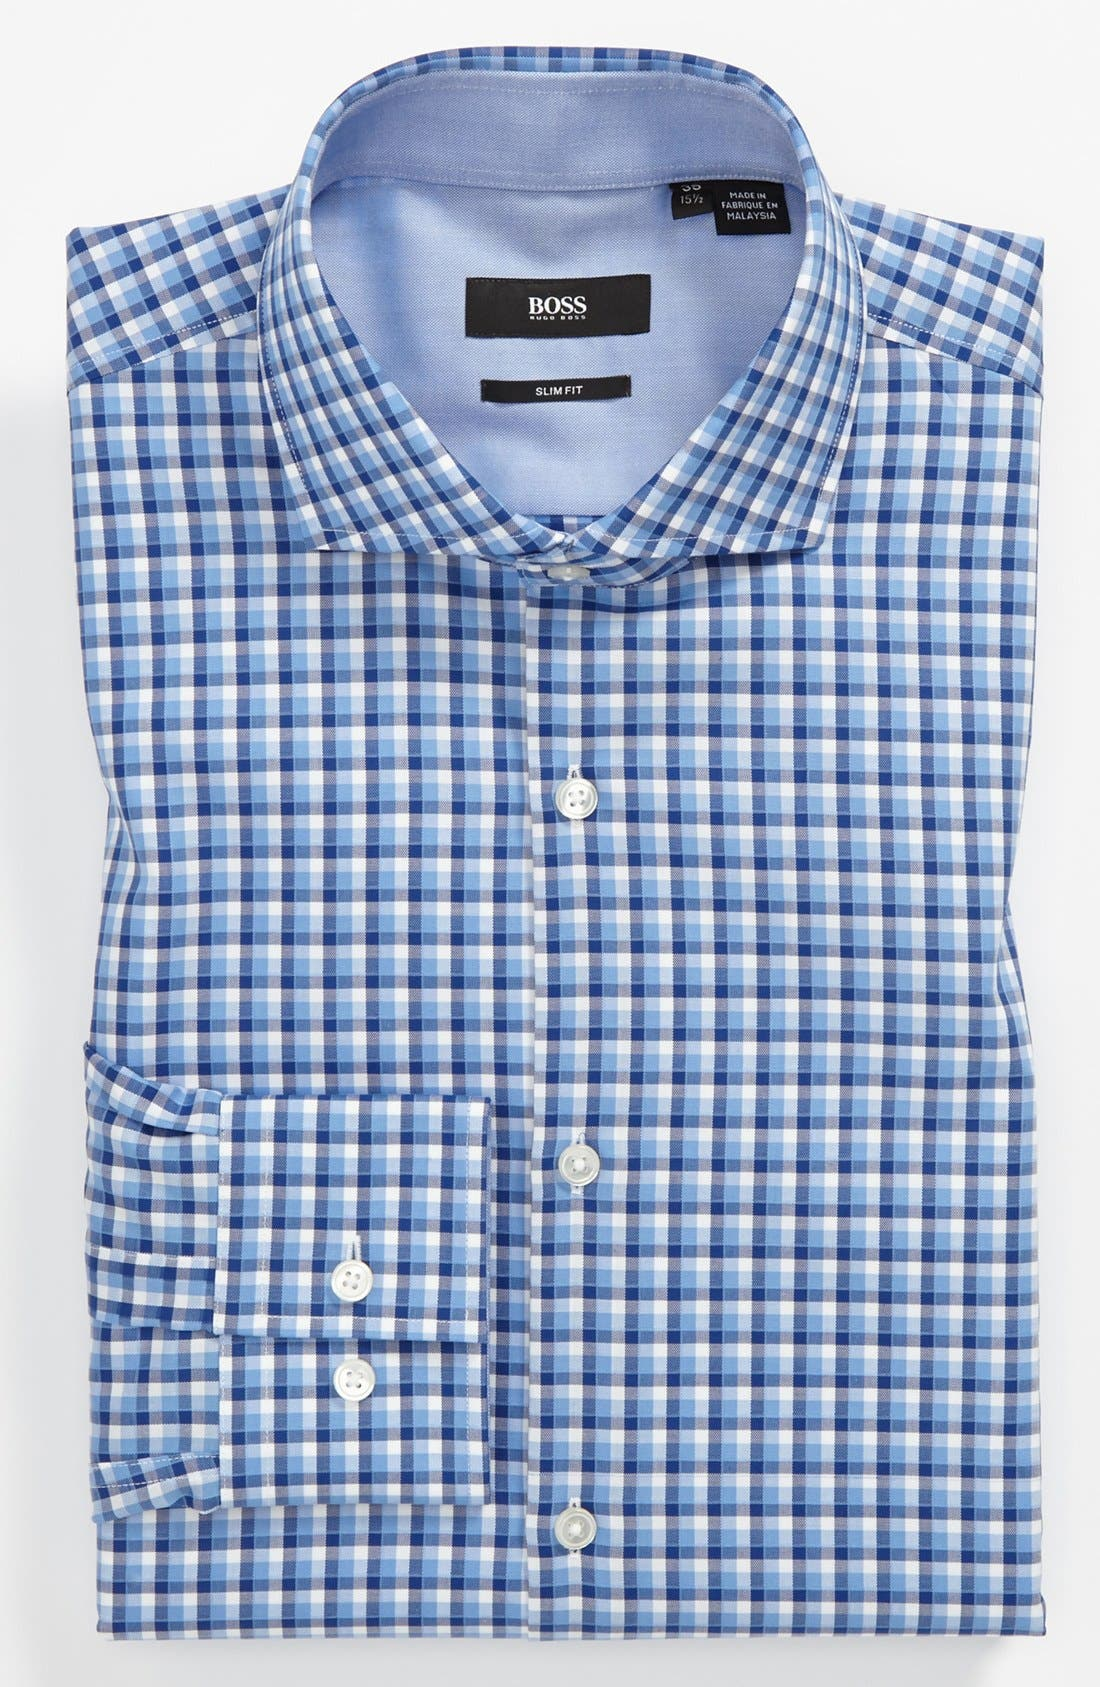 Alternate Image 1 Selected - BOSS HUGO BOSS Easy Iron 'Jonas' Slim Fit Dress Shirt